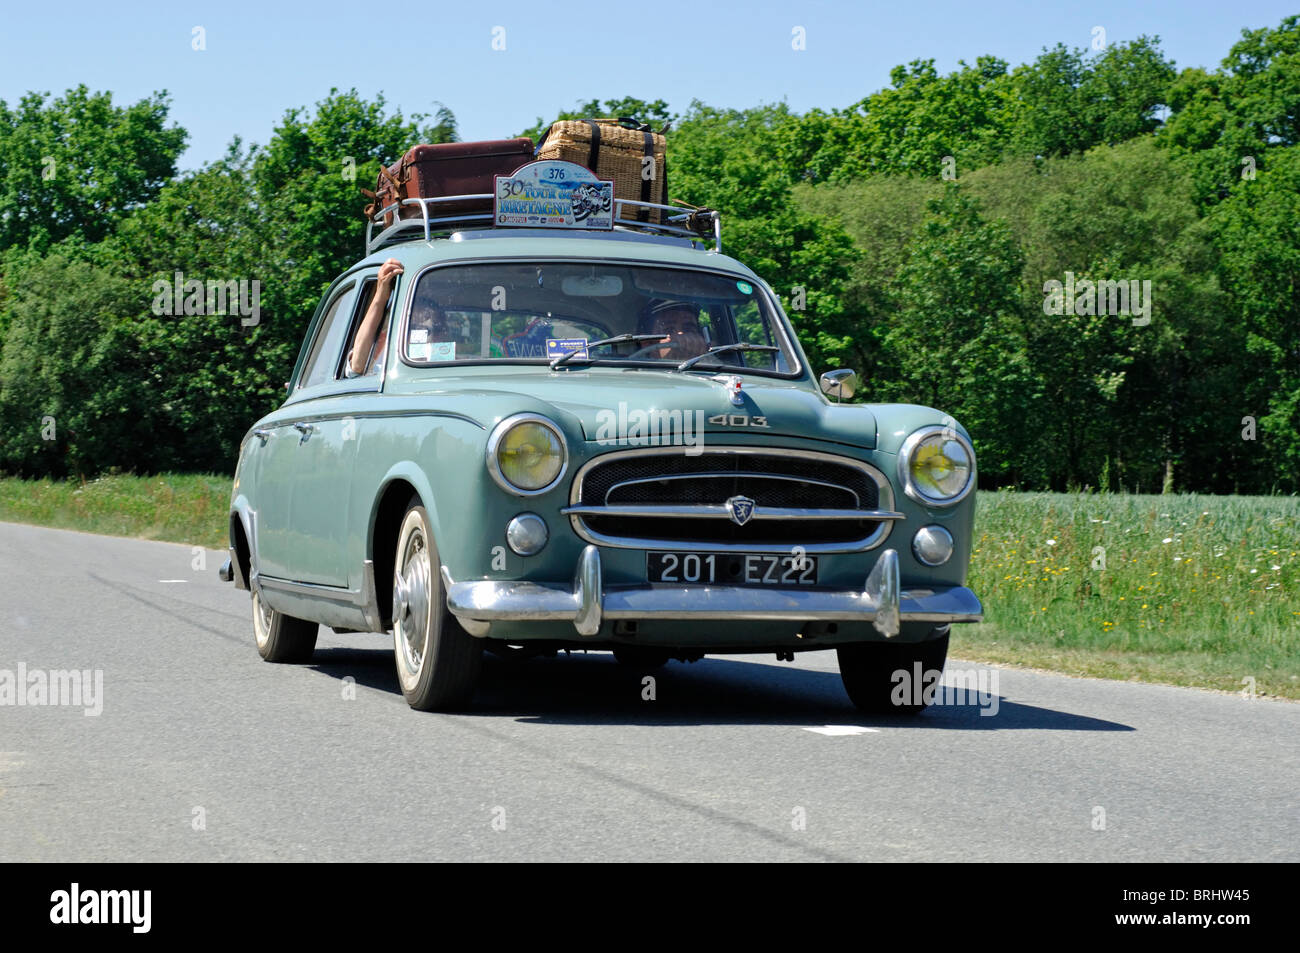 Peugeot bretagne auto